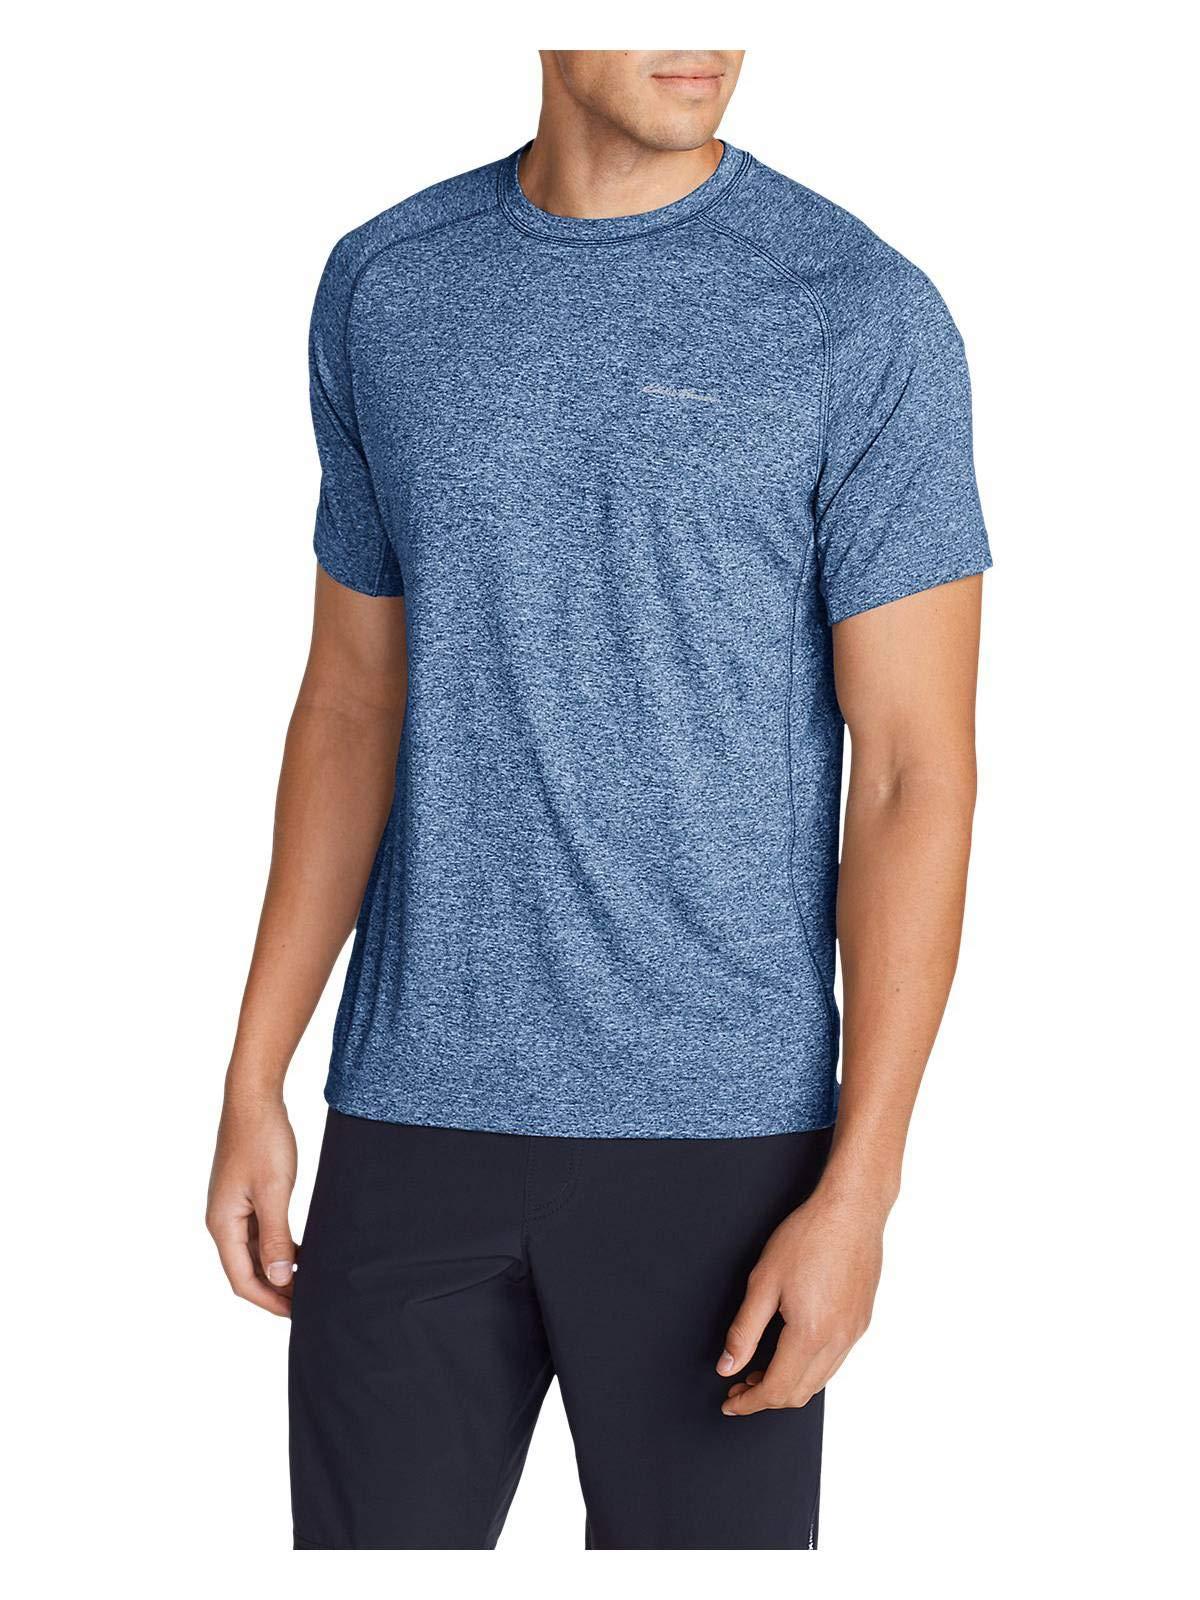 Eddie Bauer Men's Resolution Short-Sleeve T-Shirt, HTR Blue Regular S